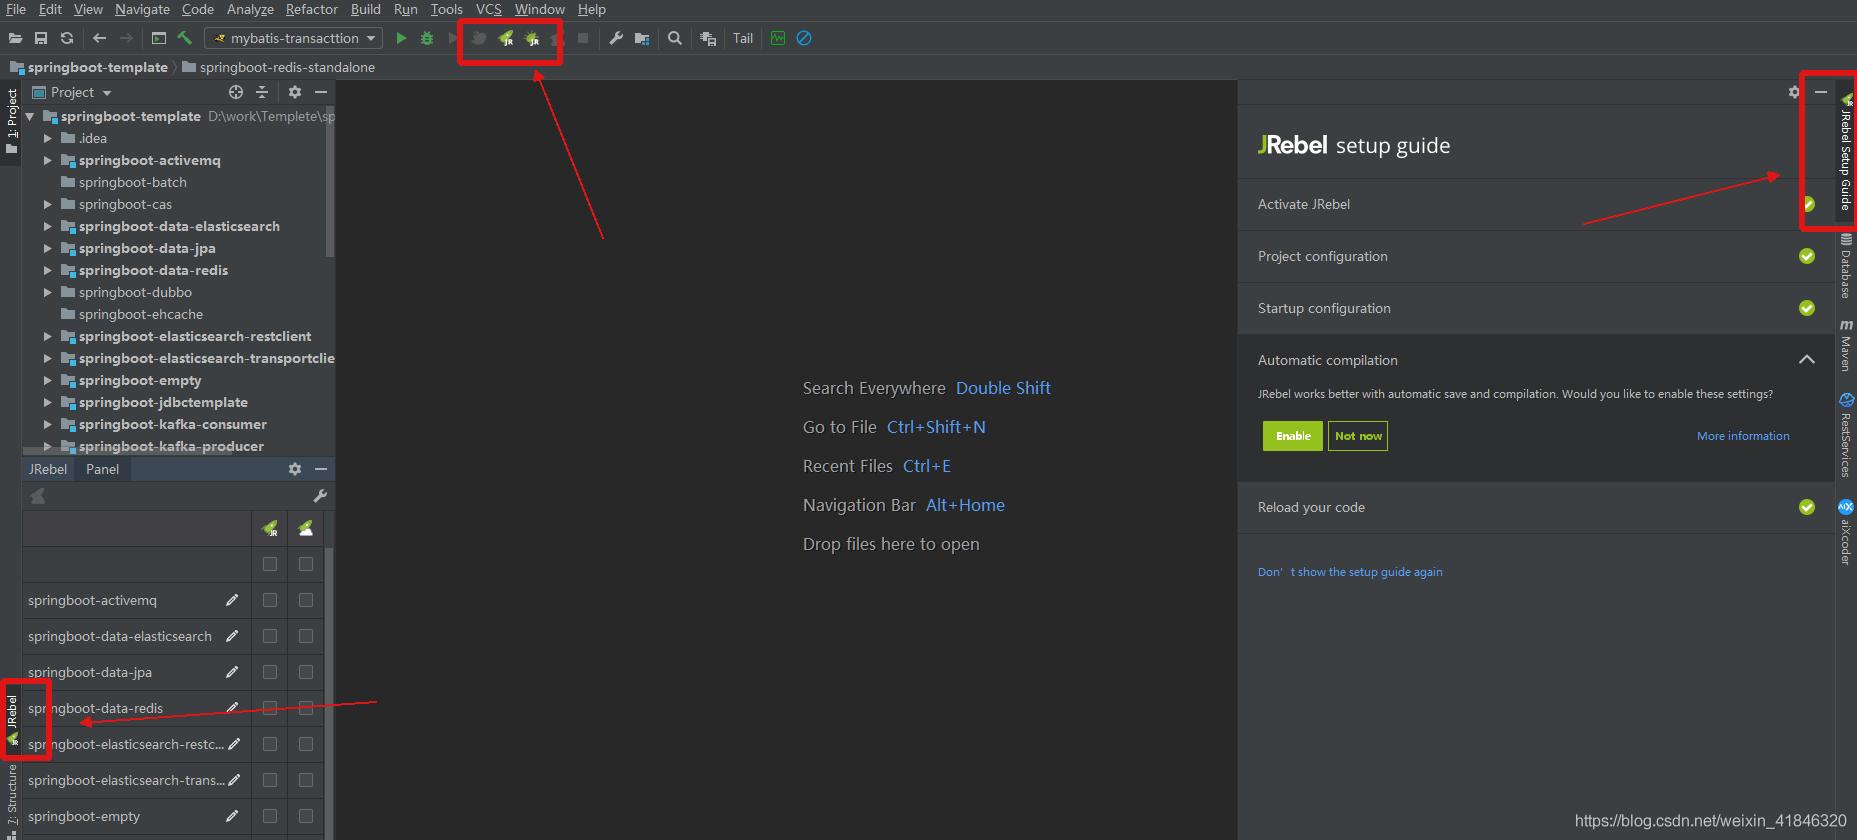 IntelliJ Idea 常用12款插件(提高开发效率),附优秀主题插件插图(18)